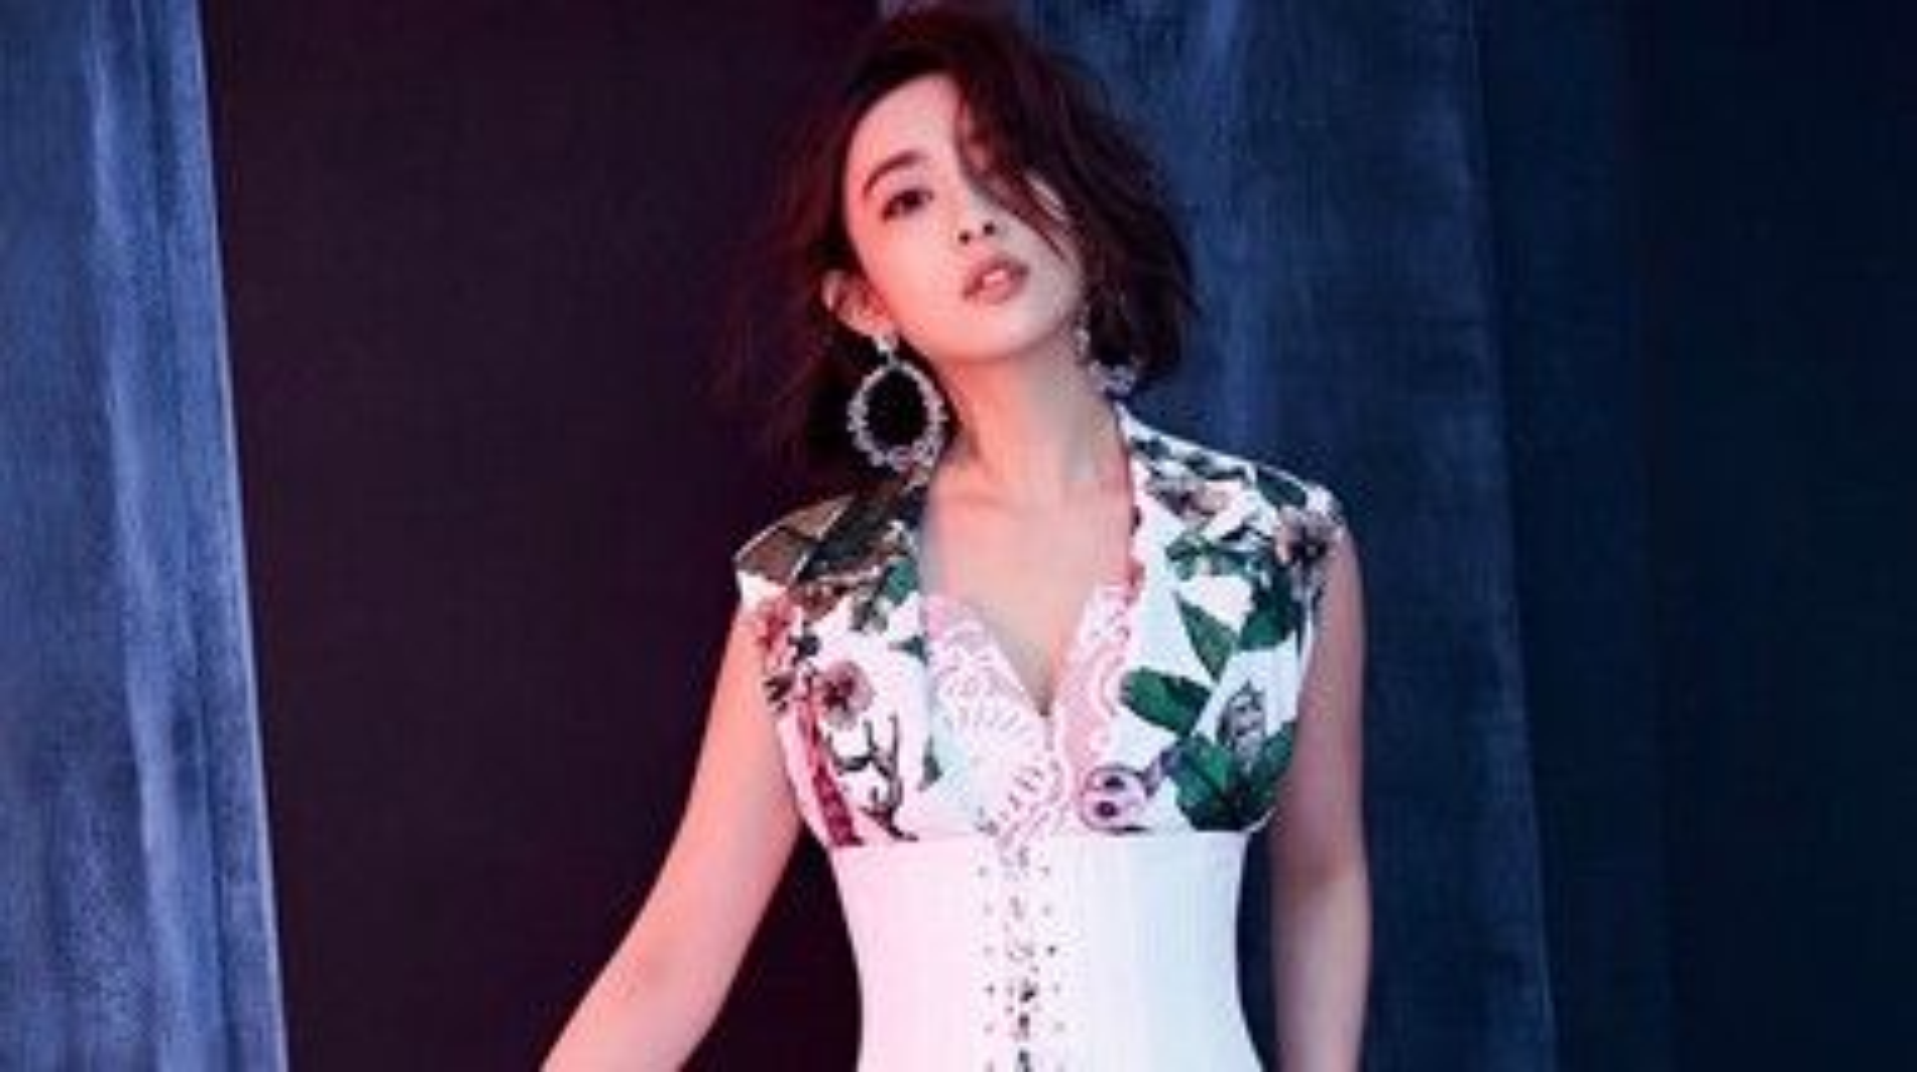 Zoey Meng